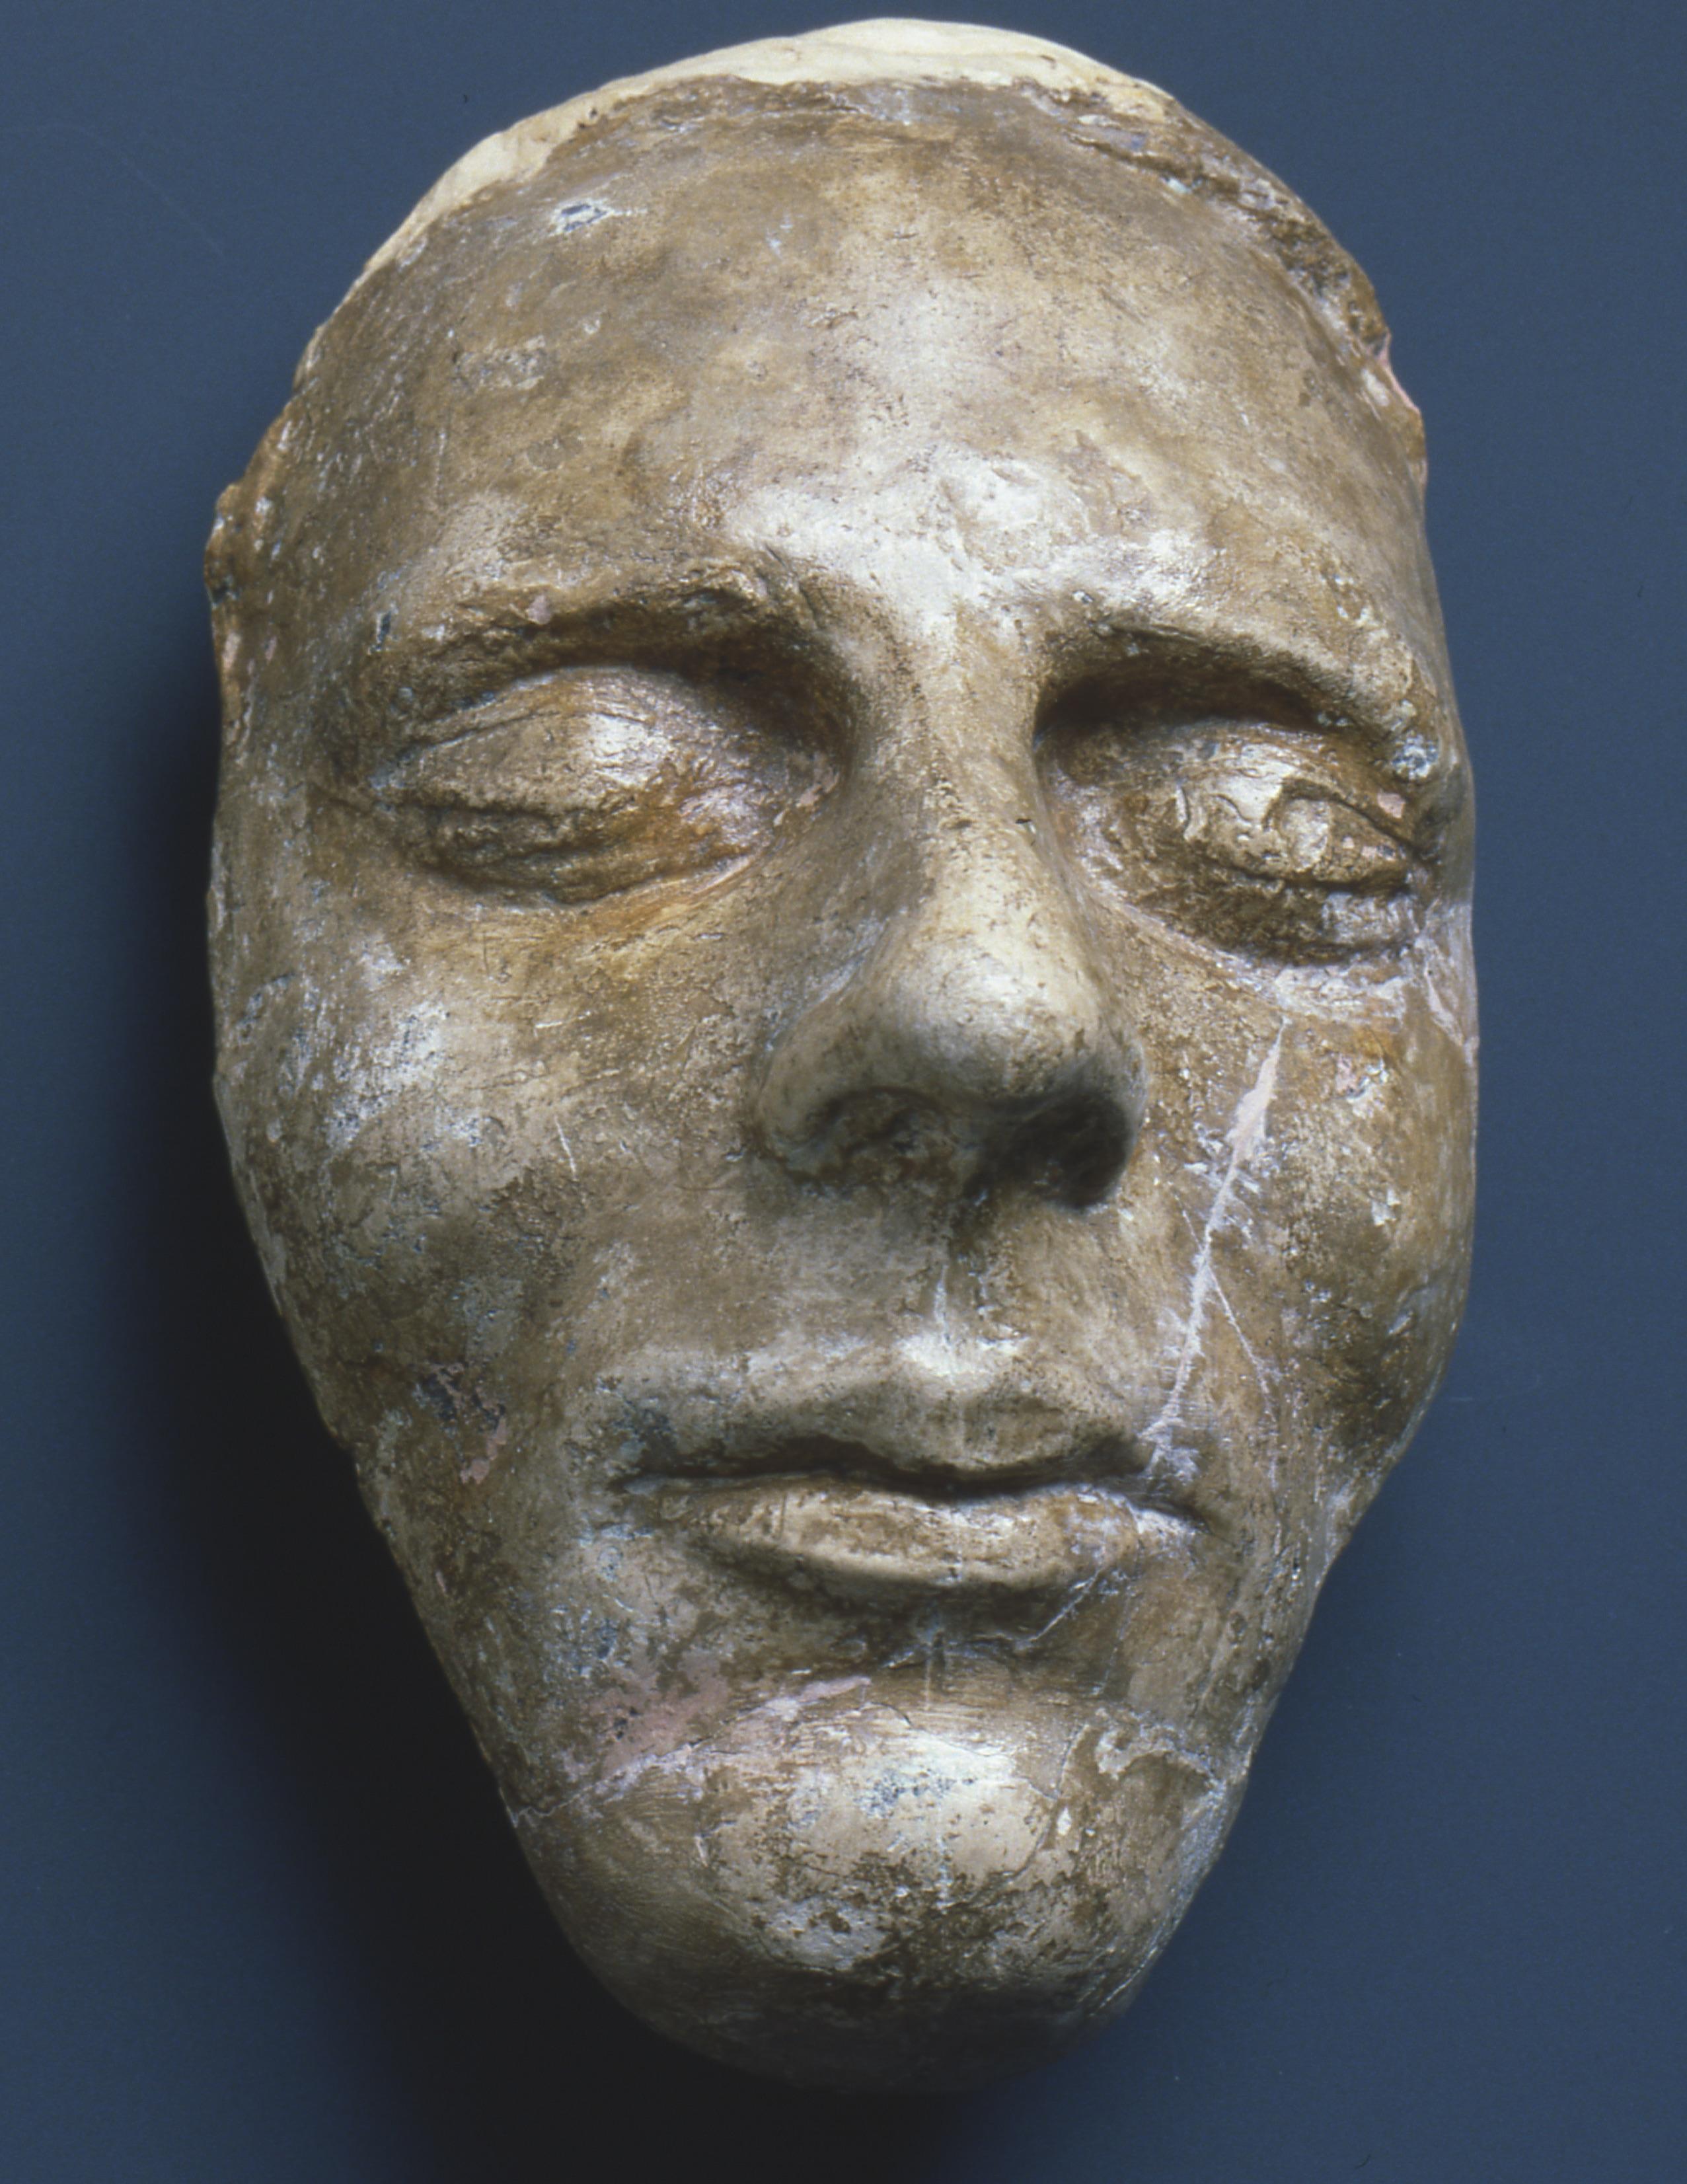 The Dibble death mask of Joseph Smith Jr.